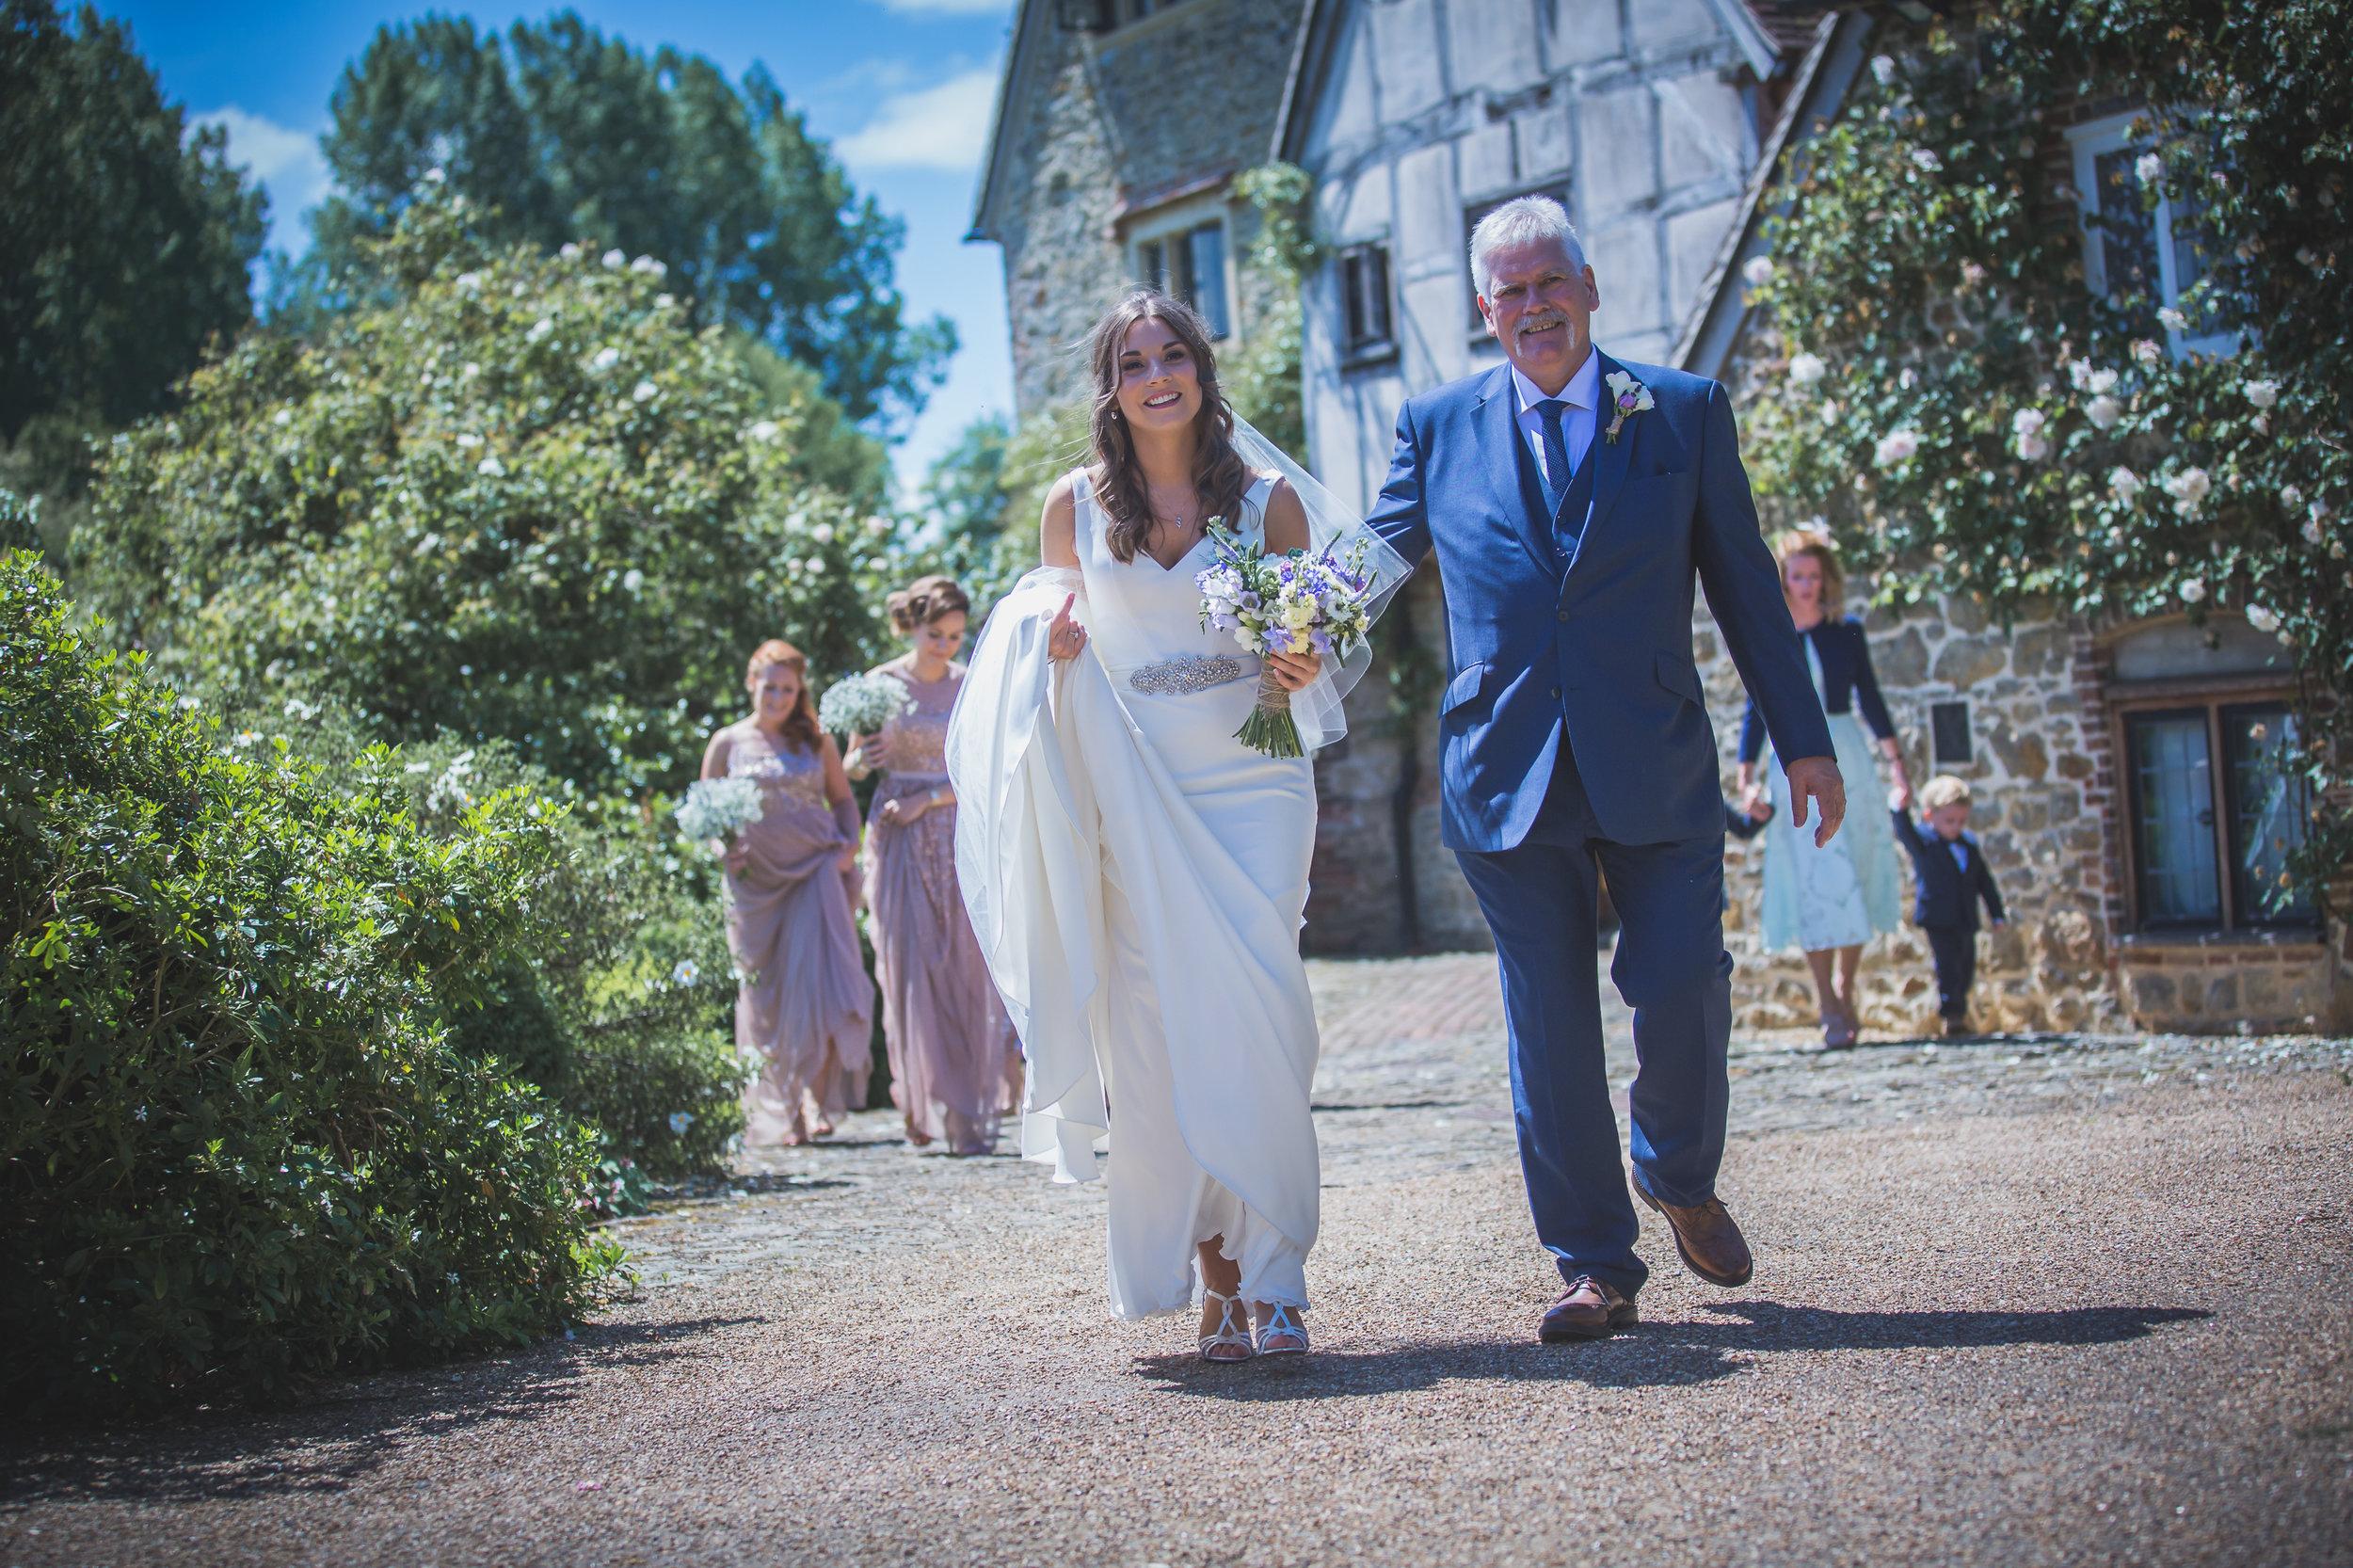 Grittenham Barn female wedding photographers west sussex petworth social-45.jpg